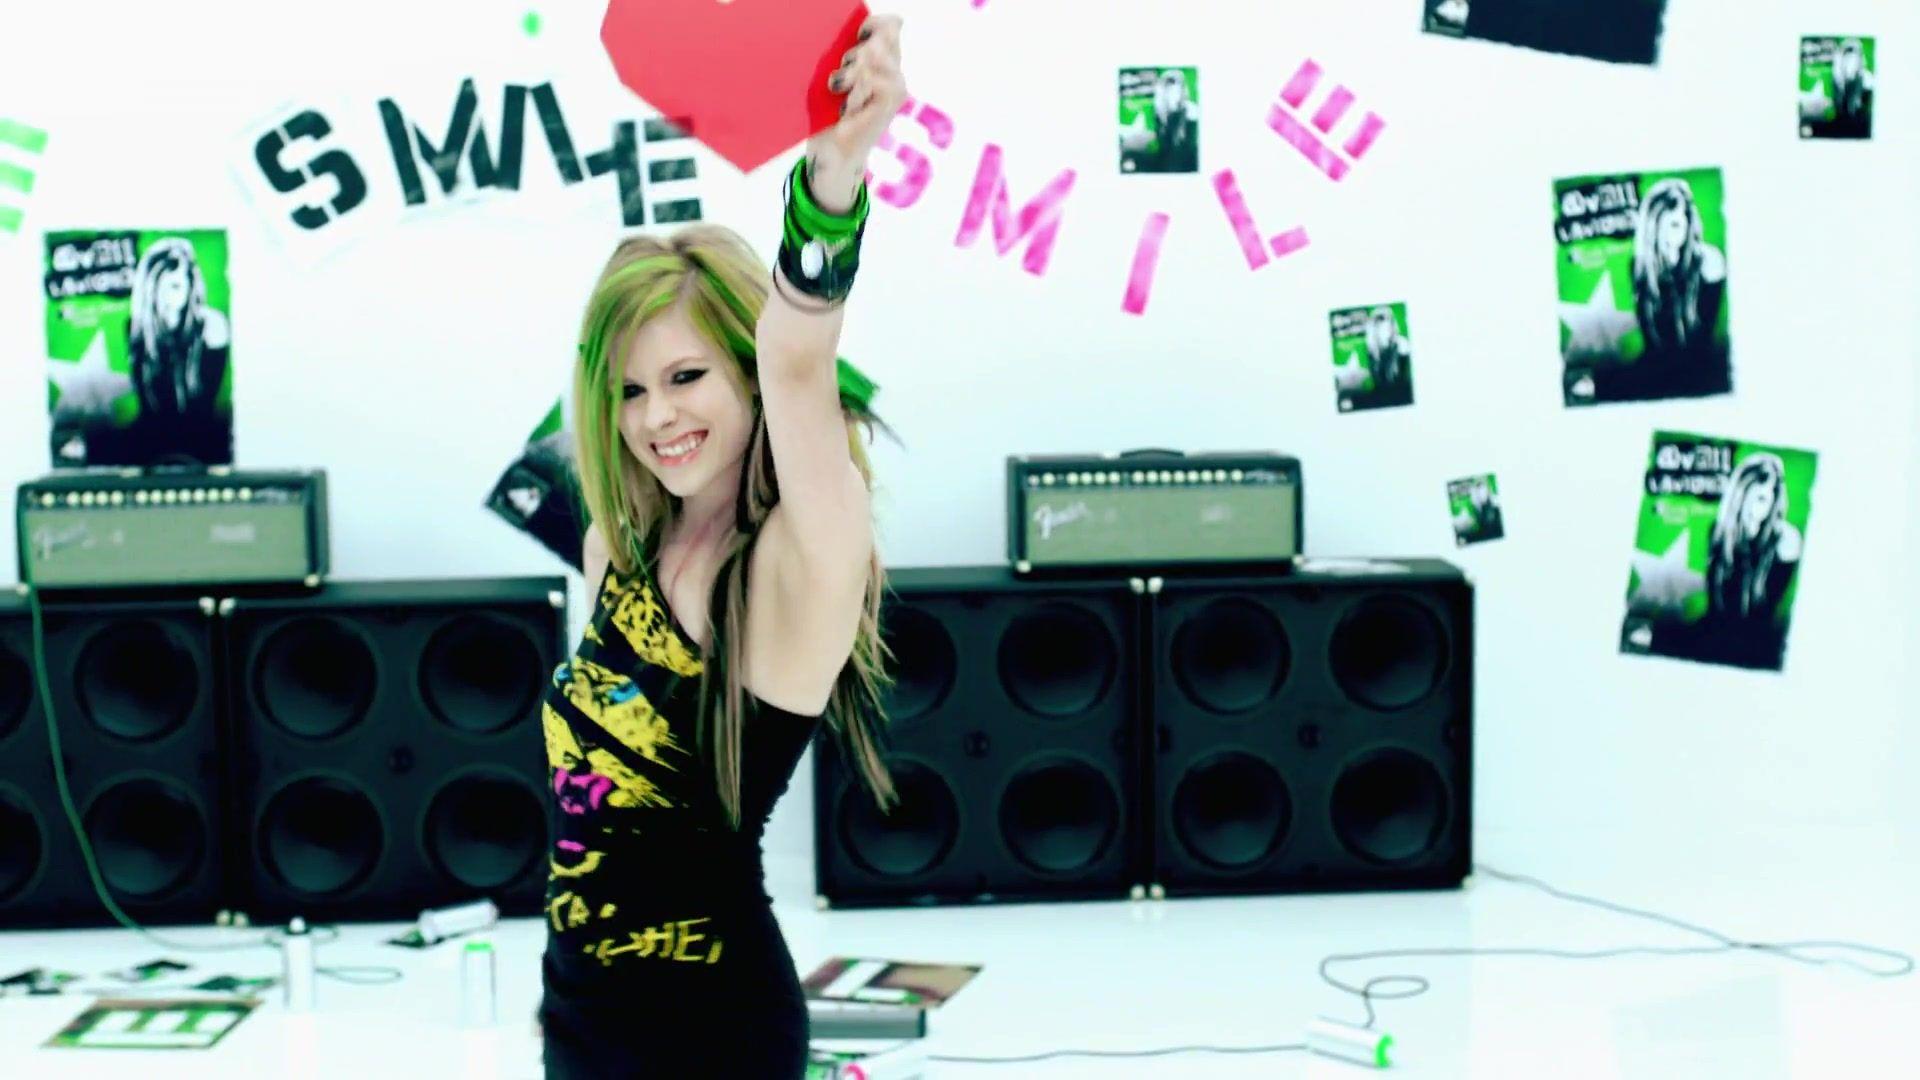 smile music video